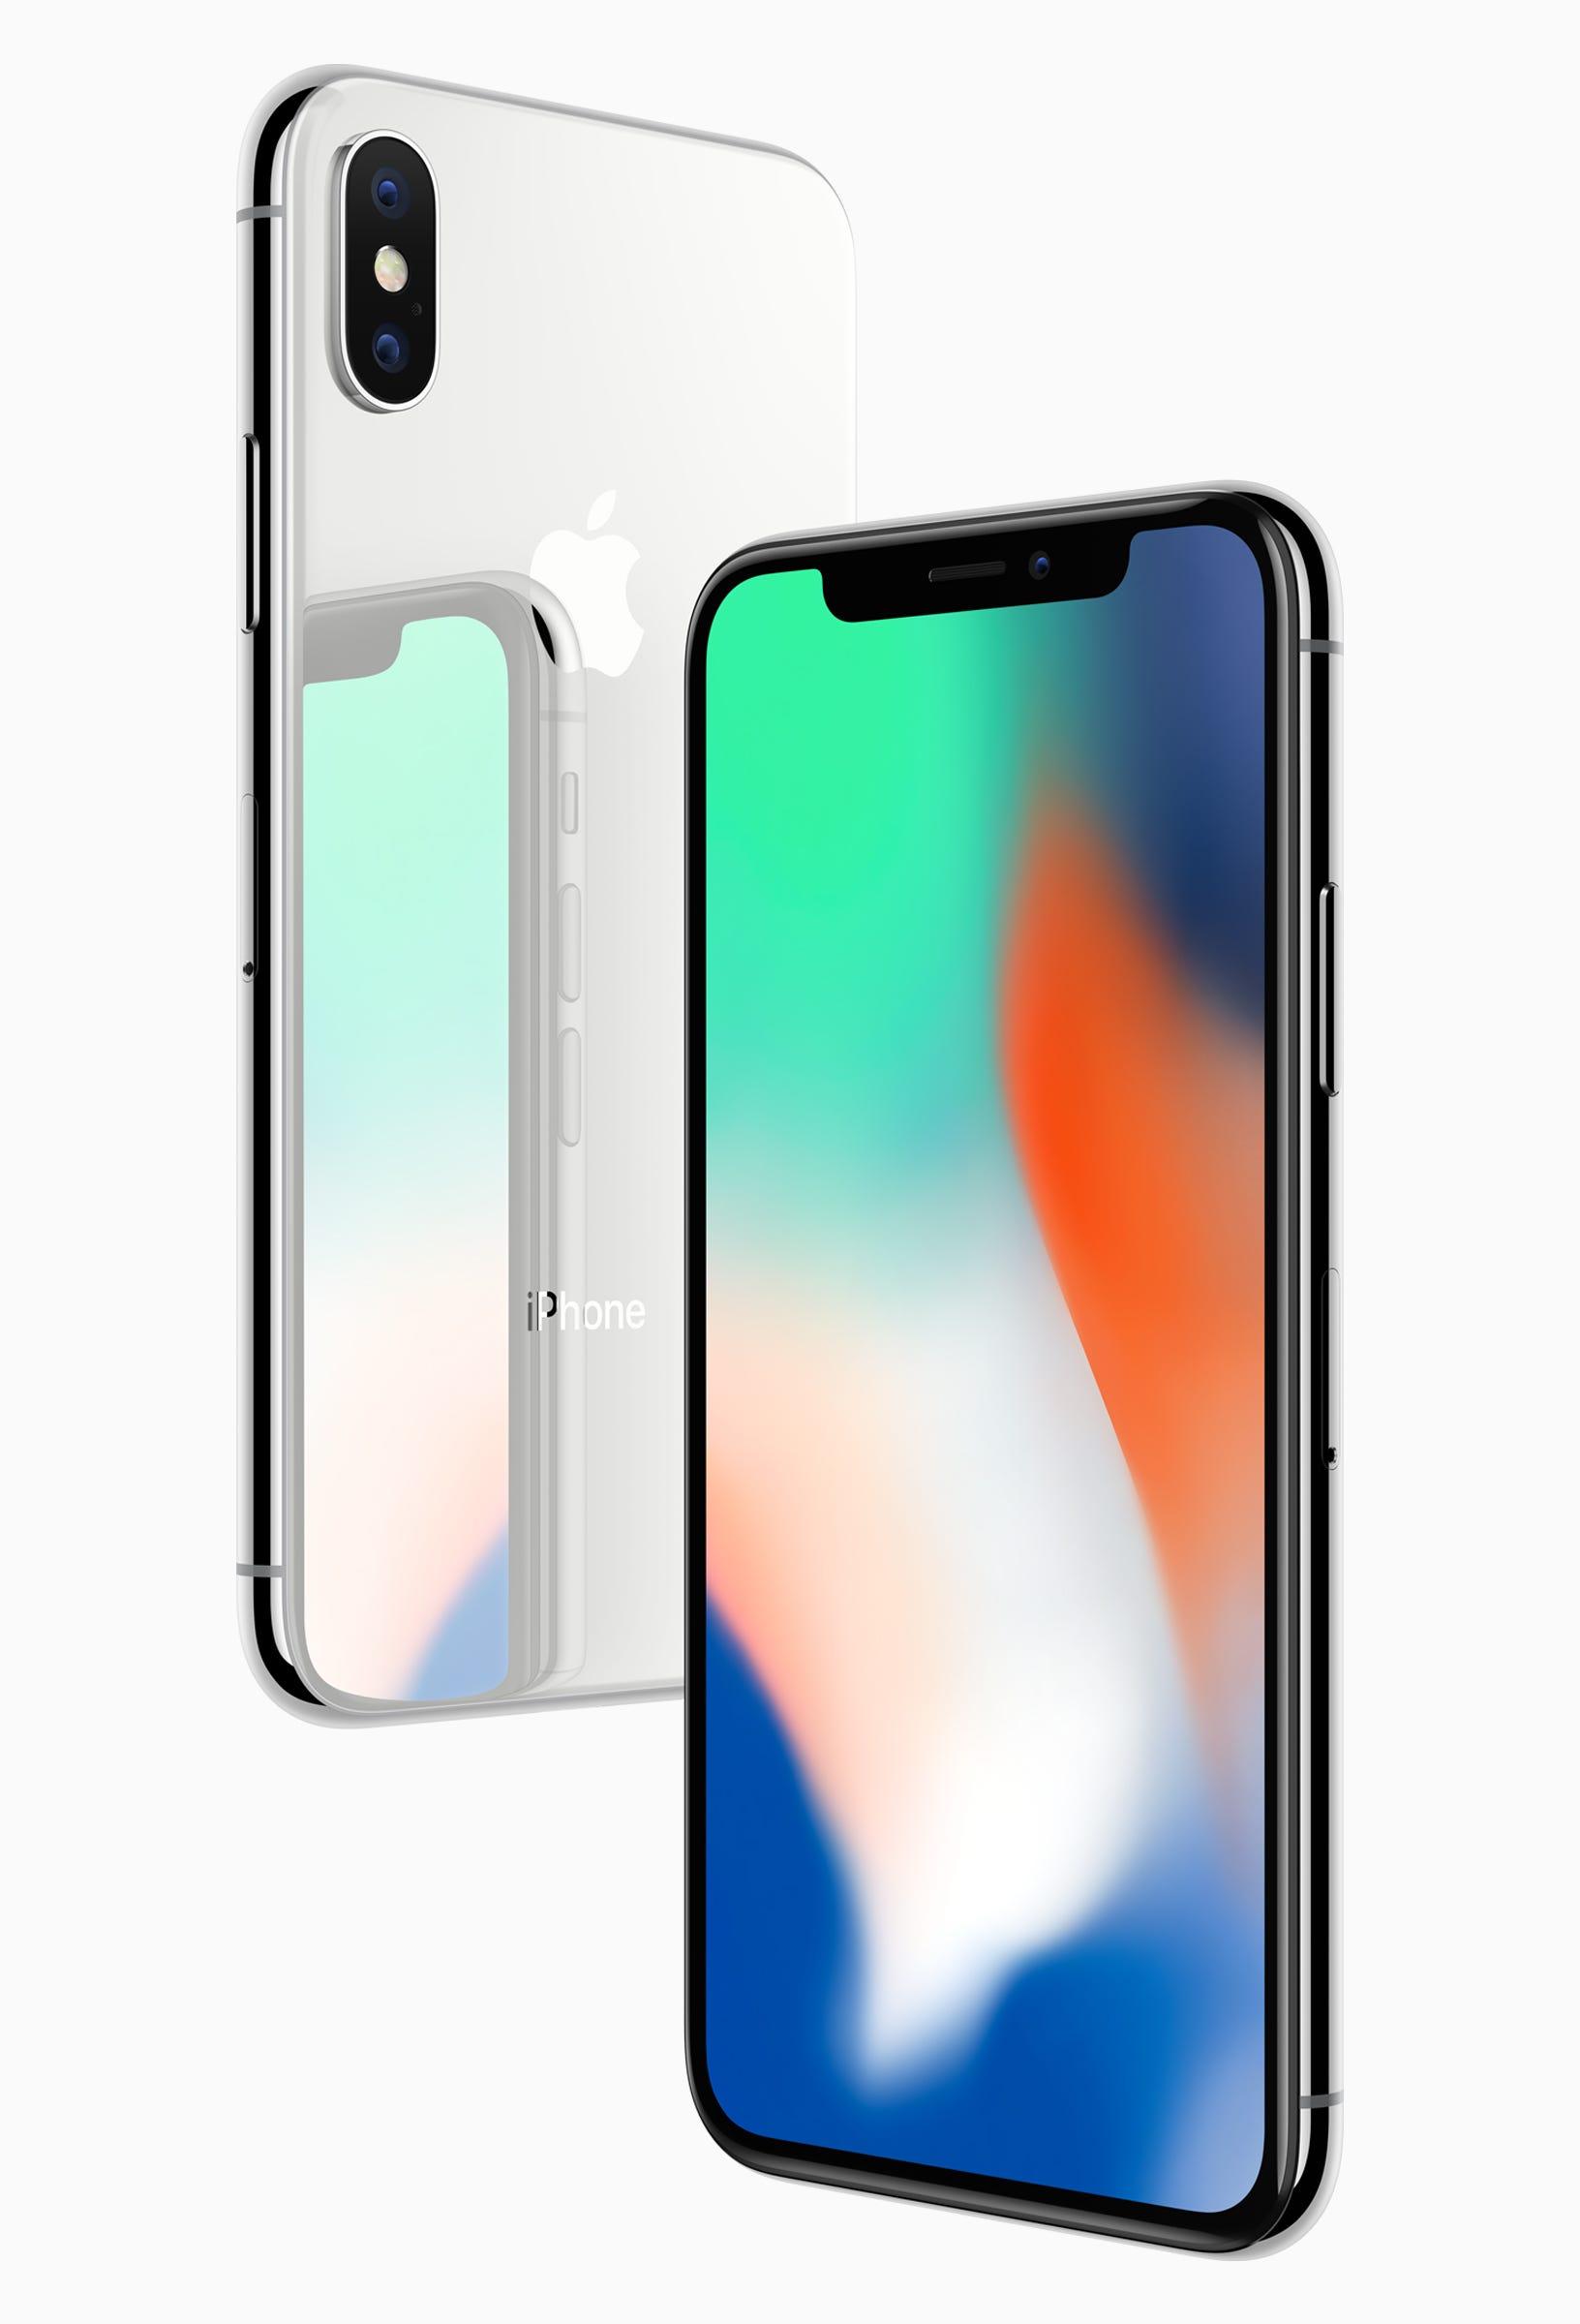 applecare iphone x worth it